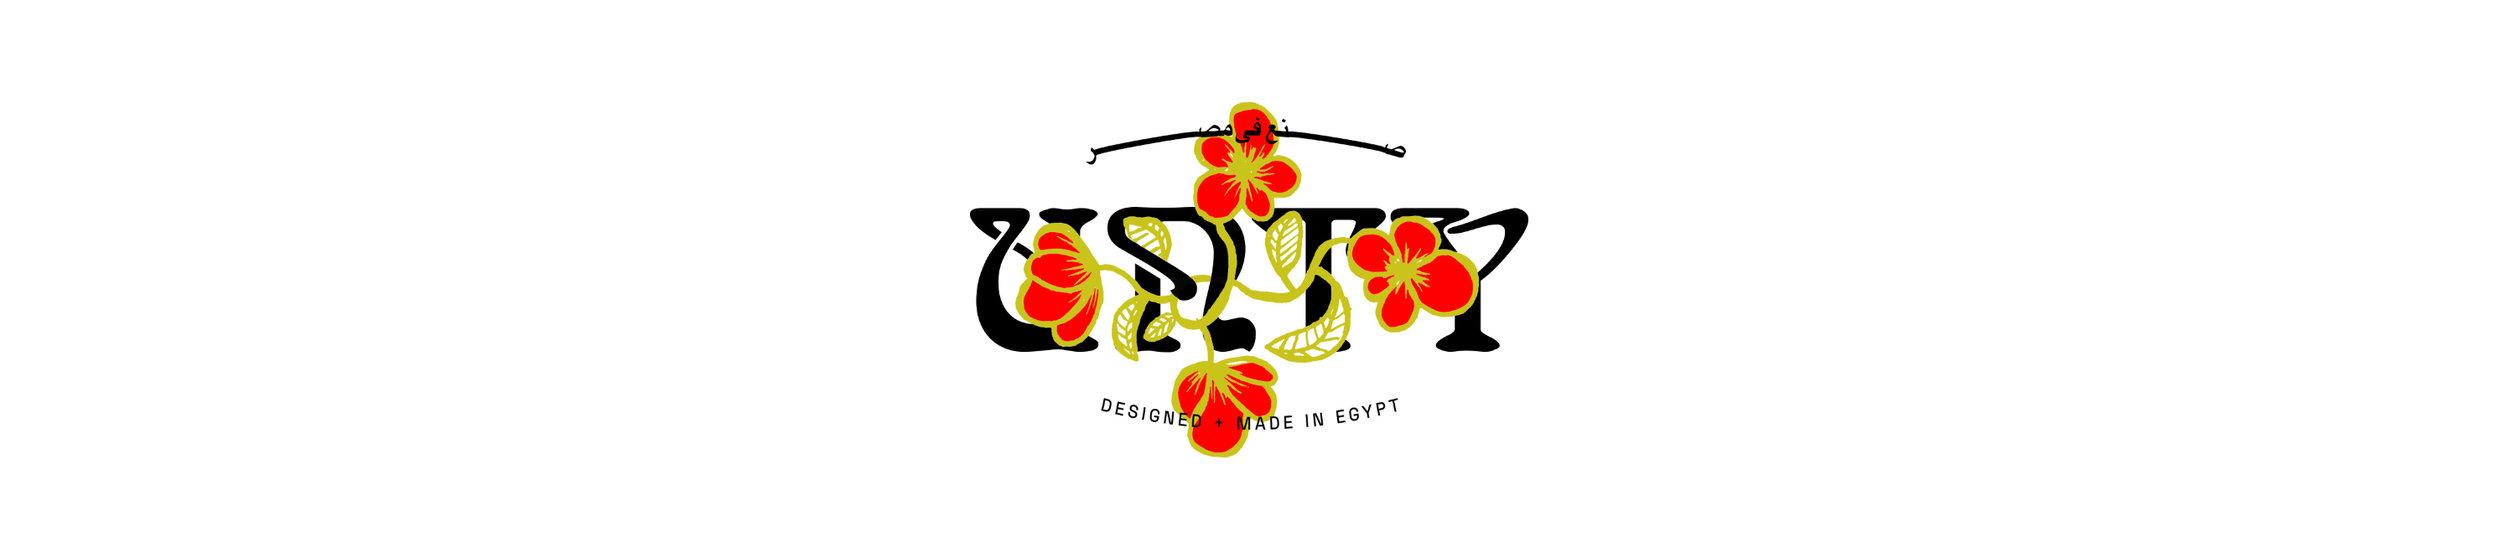 unty logo 2019.jpg